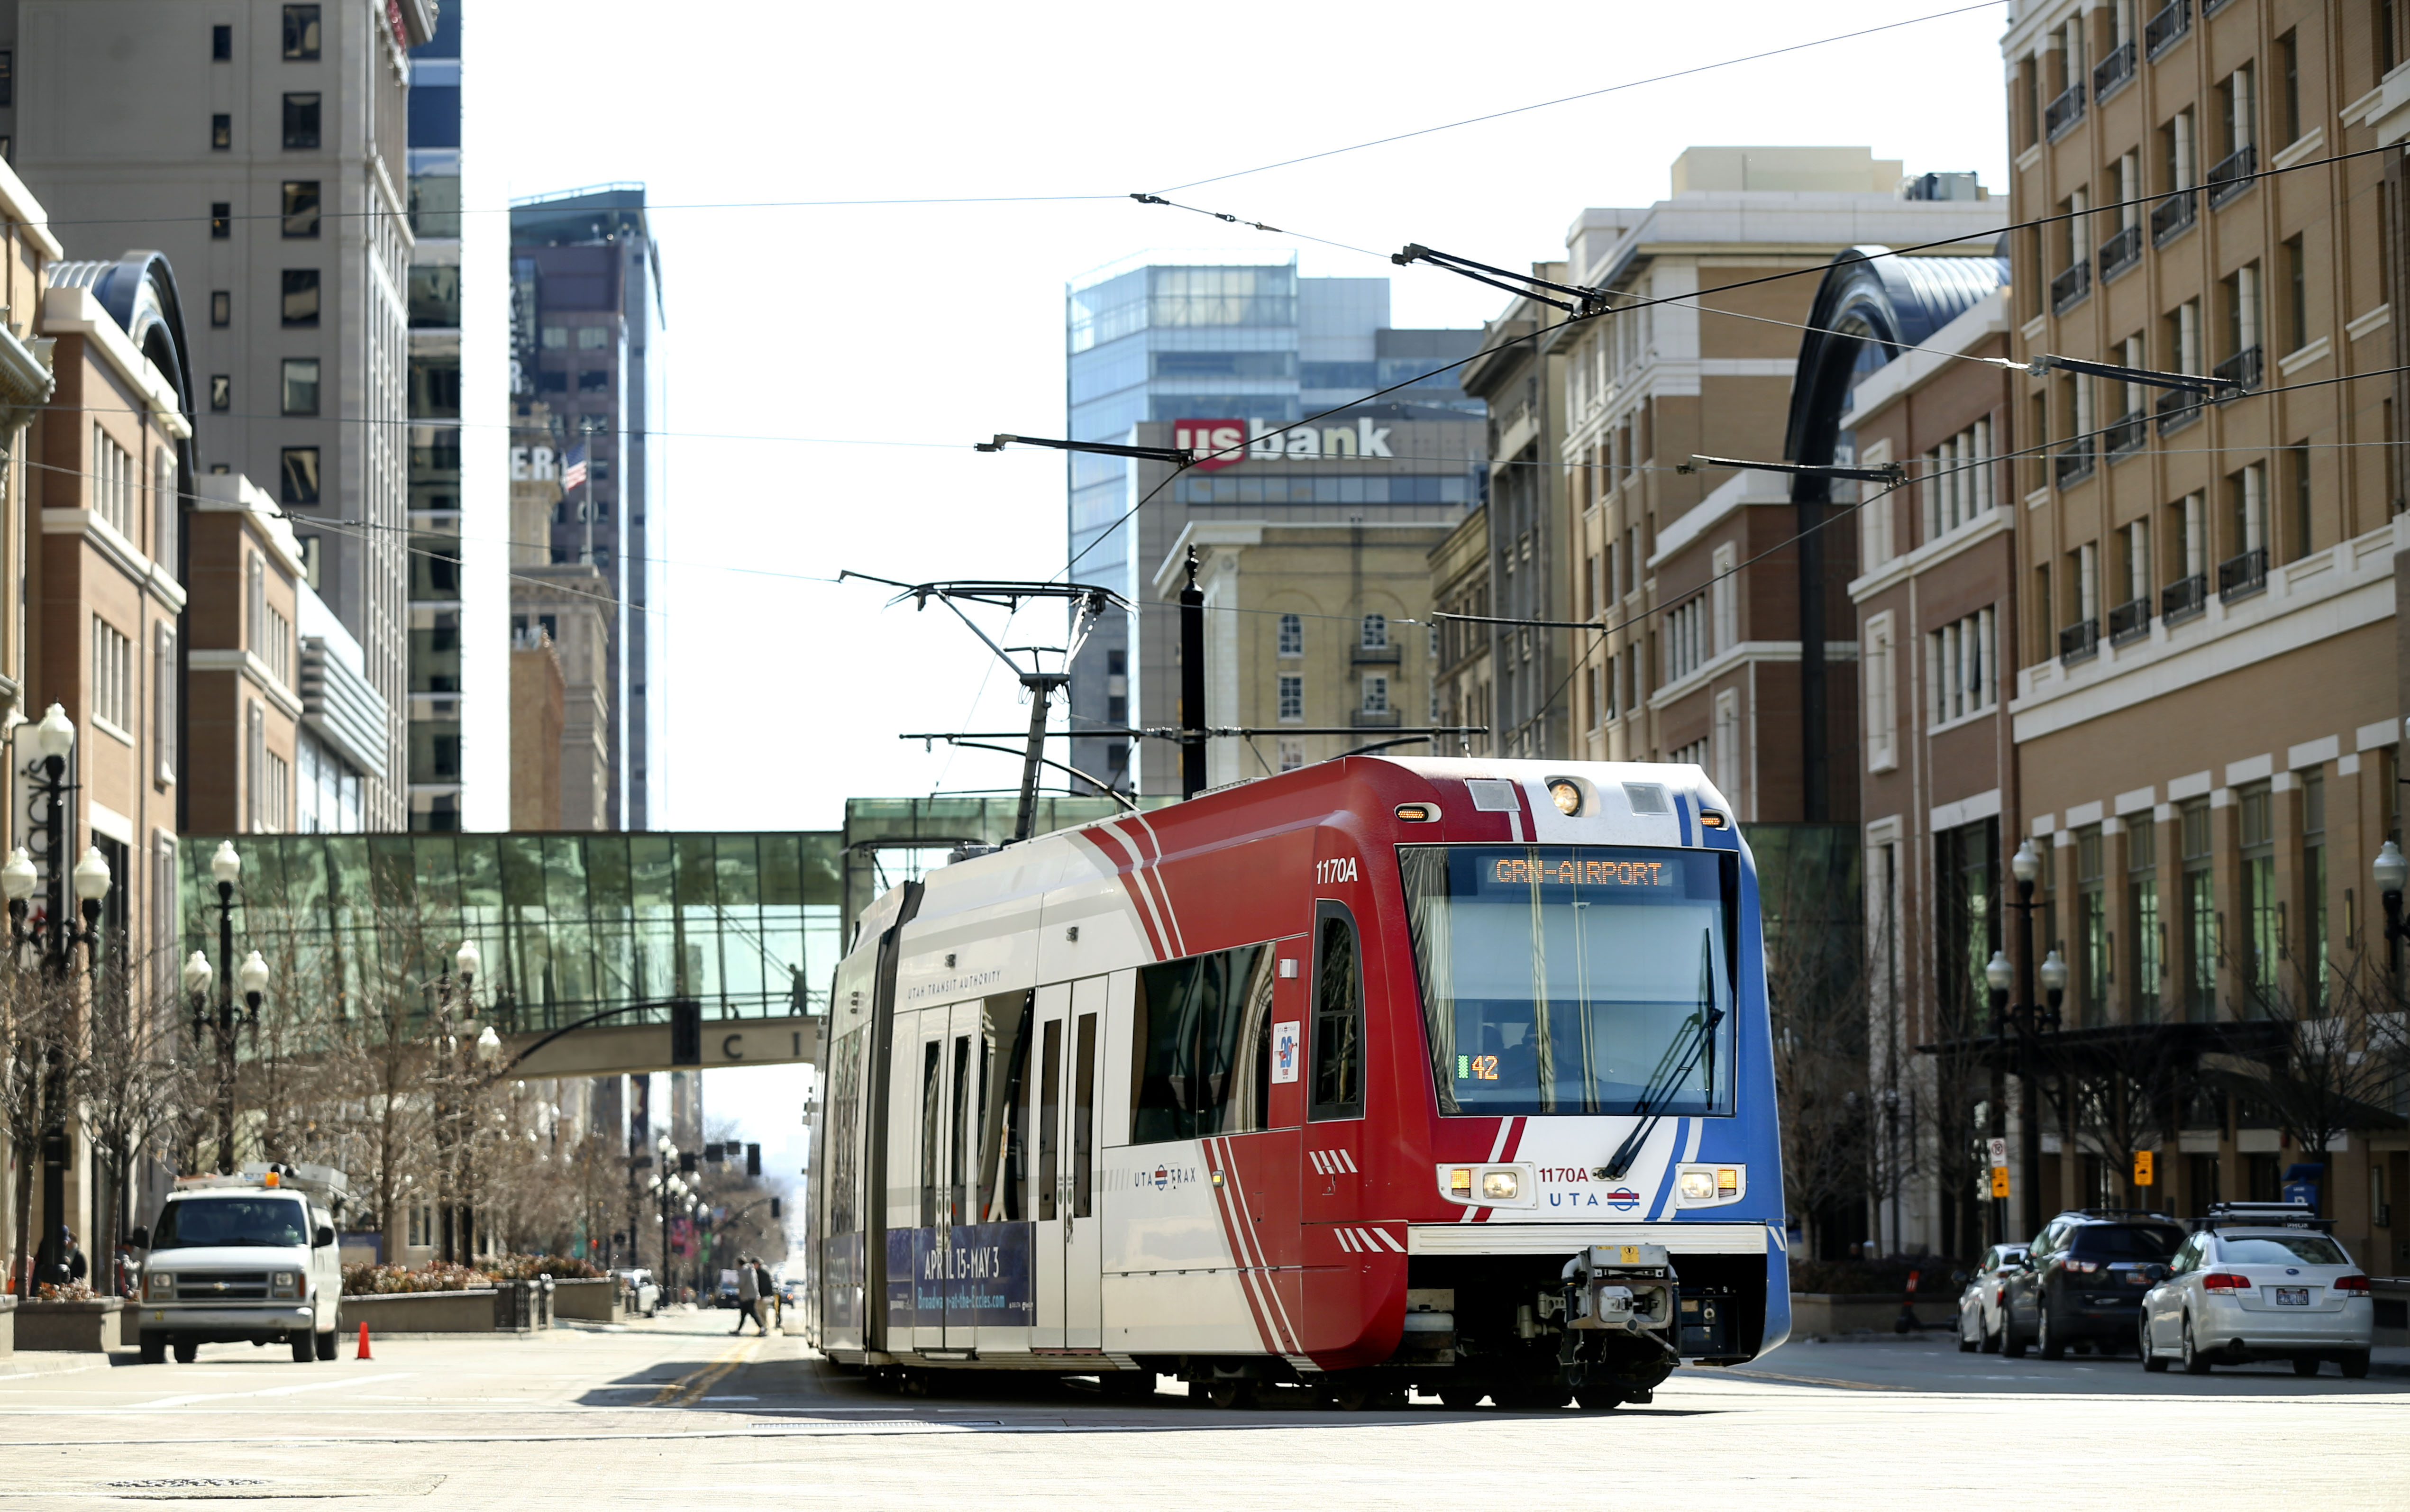 A TRAX train moves through Salt Lake City on Wednesday, Feb. 19, 2020.